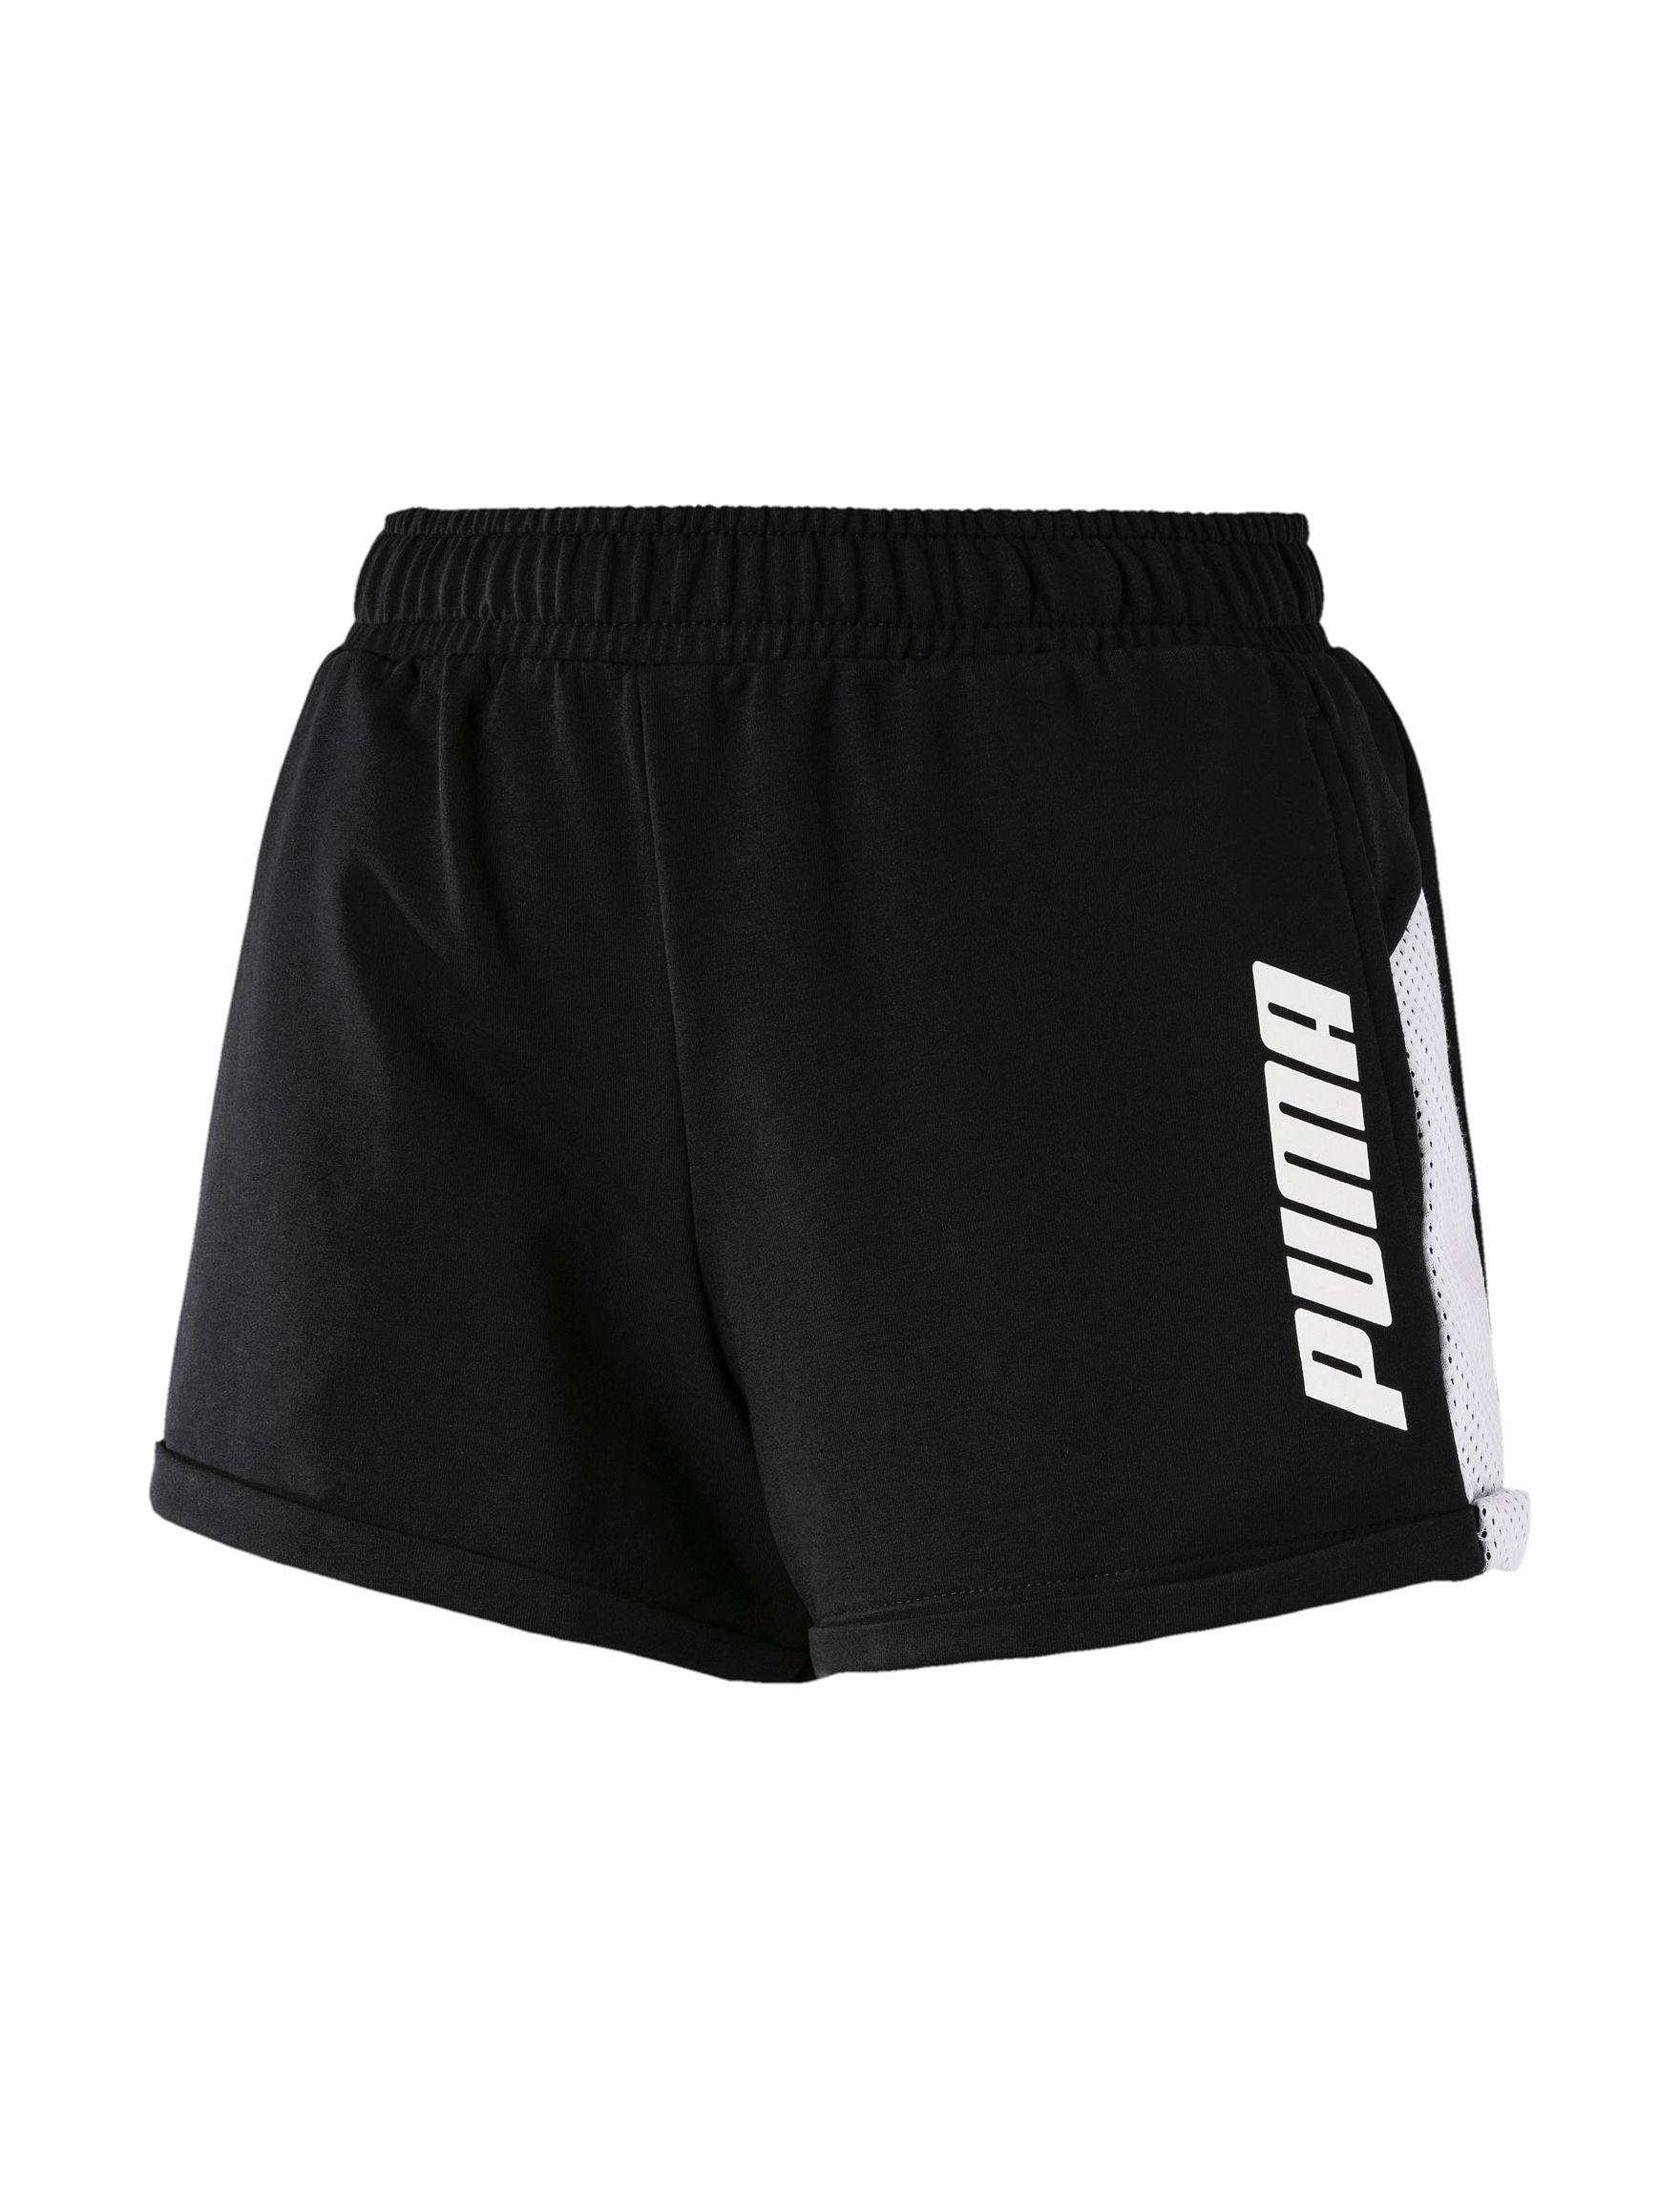 Puma Black Active Soft Shorts